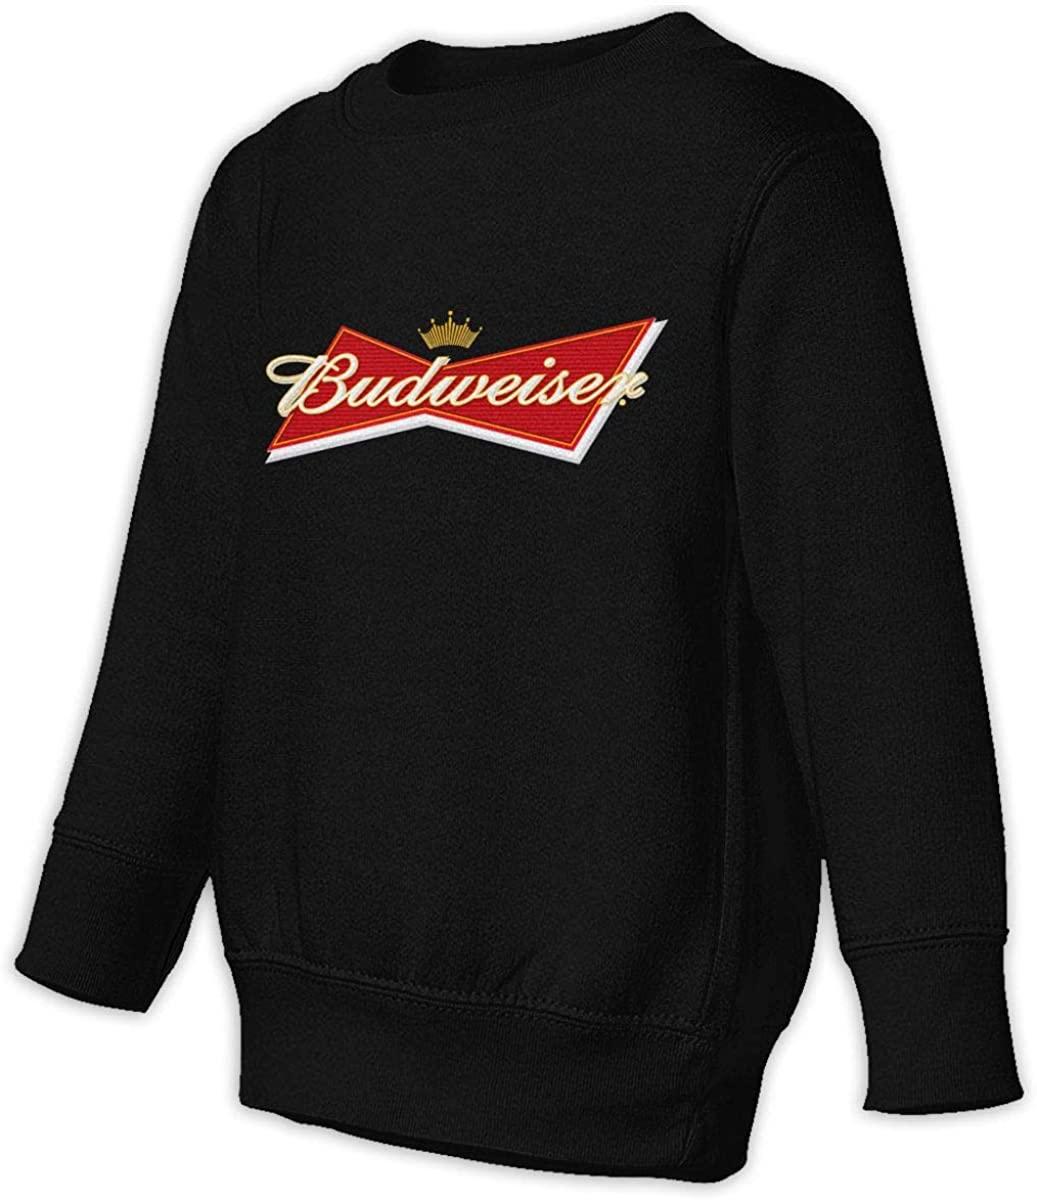 1836 Budweiser Unisex Sweatshirt Youth Boy and Girls Pullover Sweatshirt